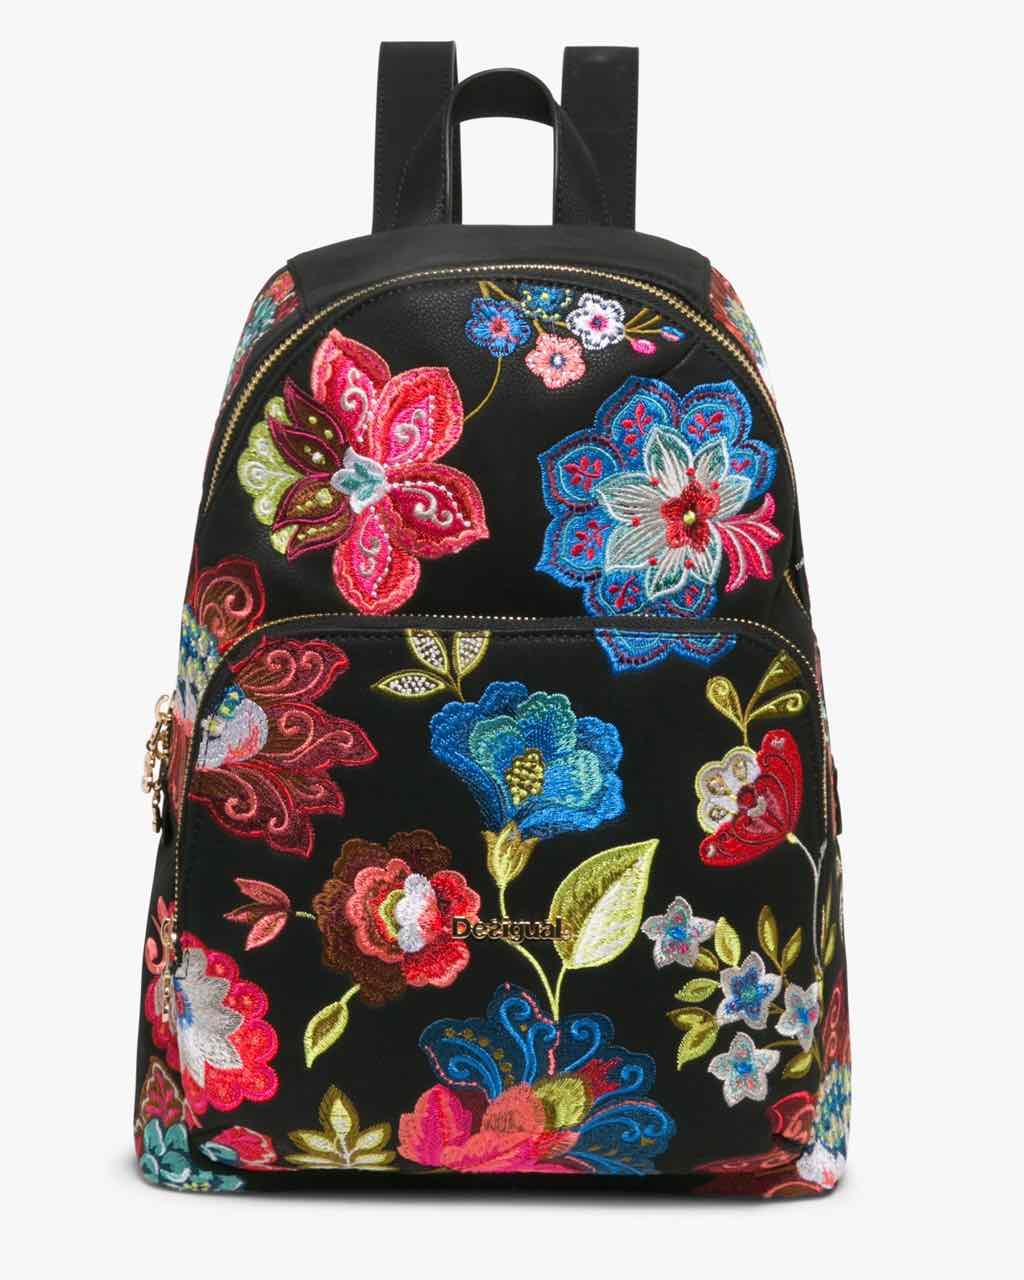 17WAXPDA_2000 Desigual Backpack Lima Caribou Buy Online